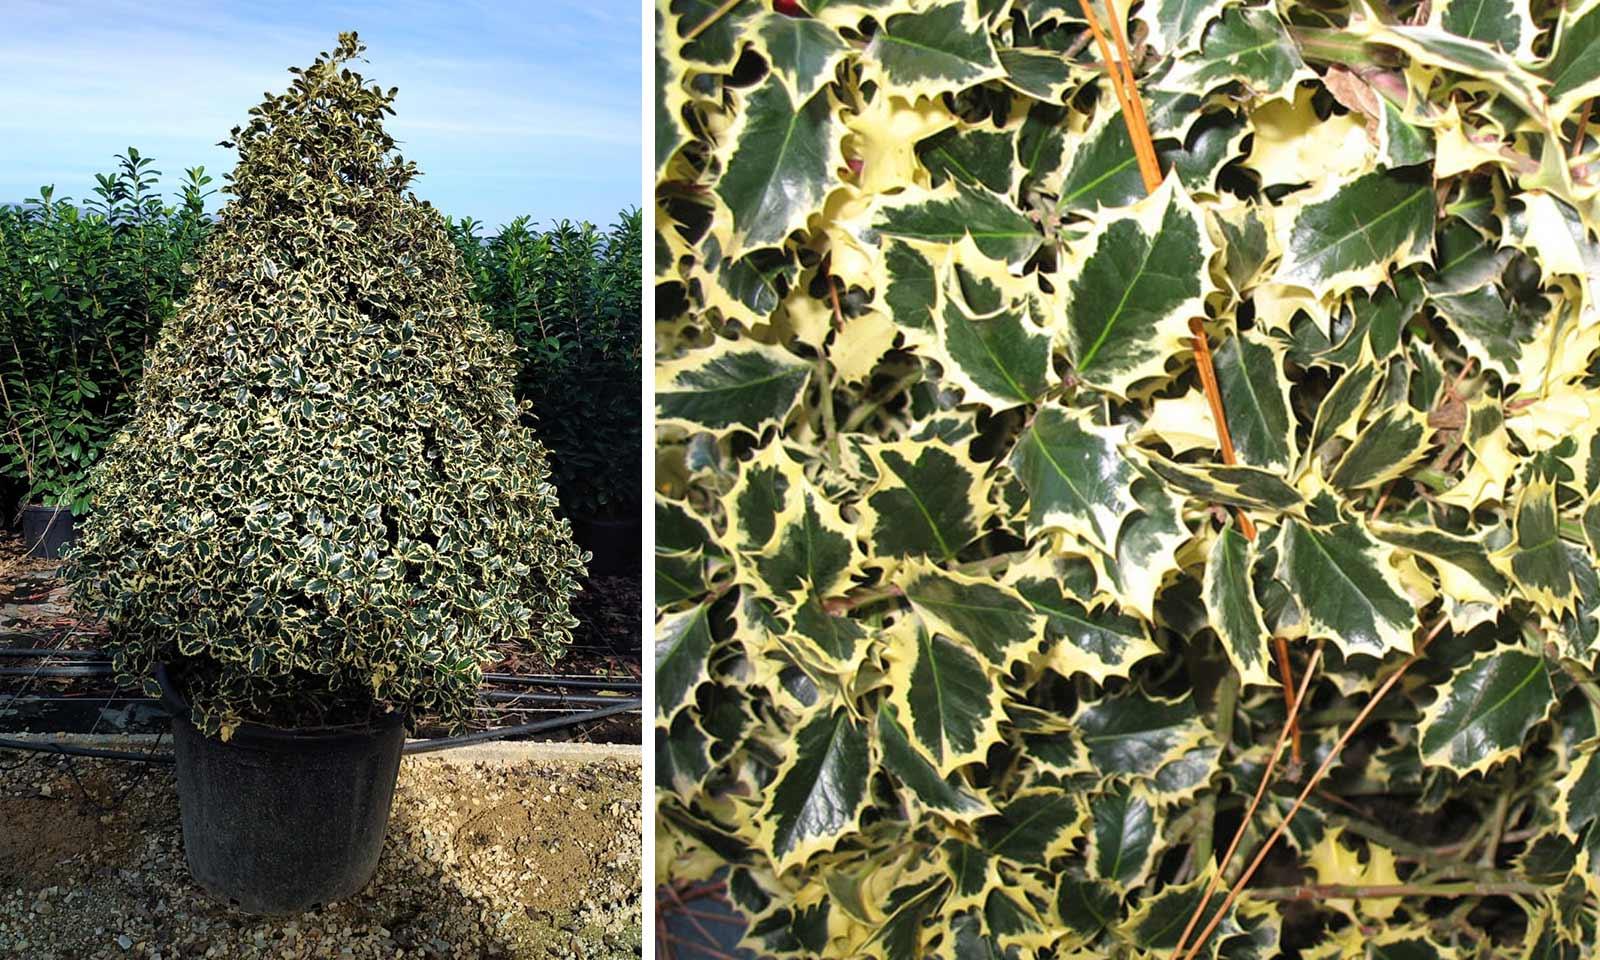 Ilex Aquifolium 'Argenteomarginata' (Variegated English Holly) – Extra